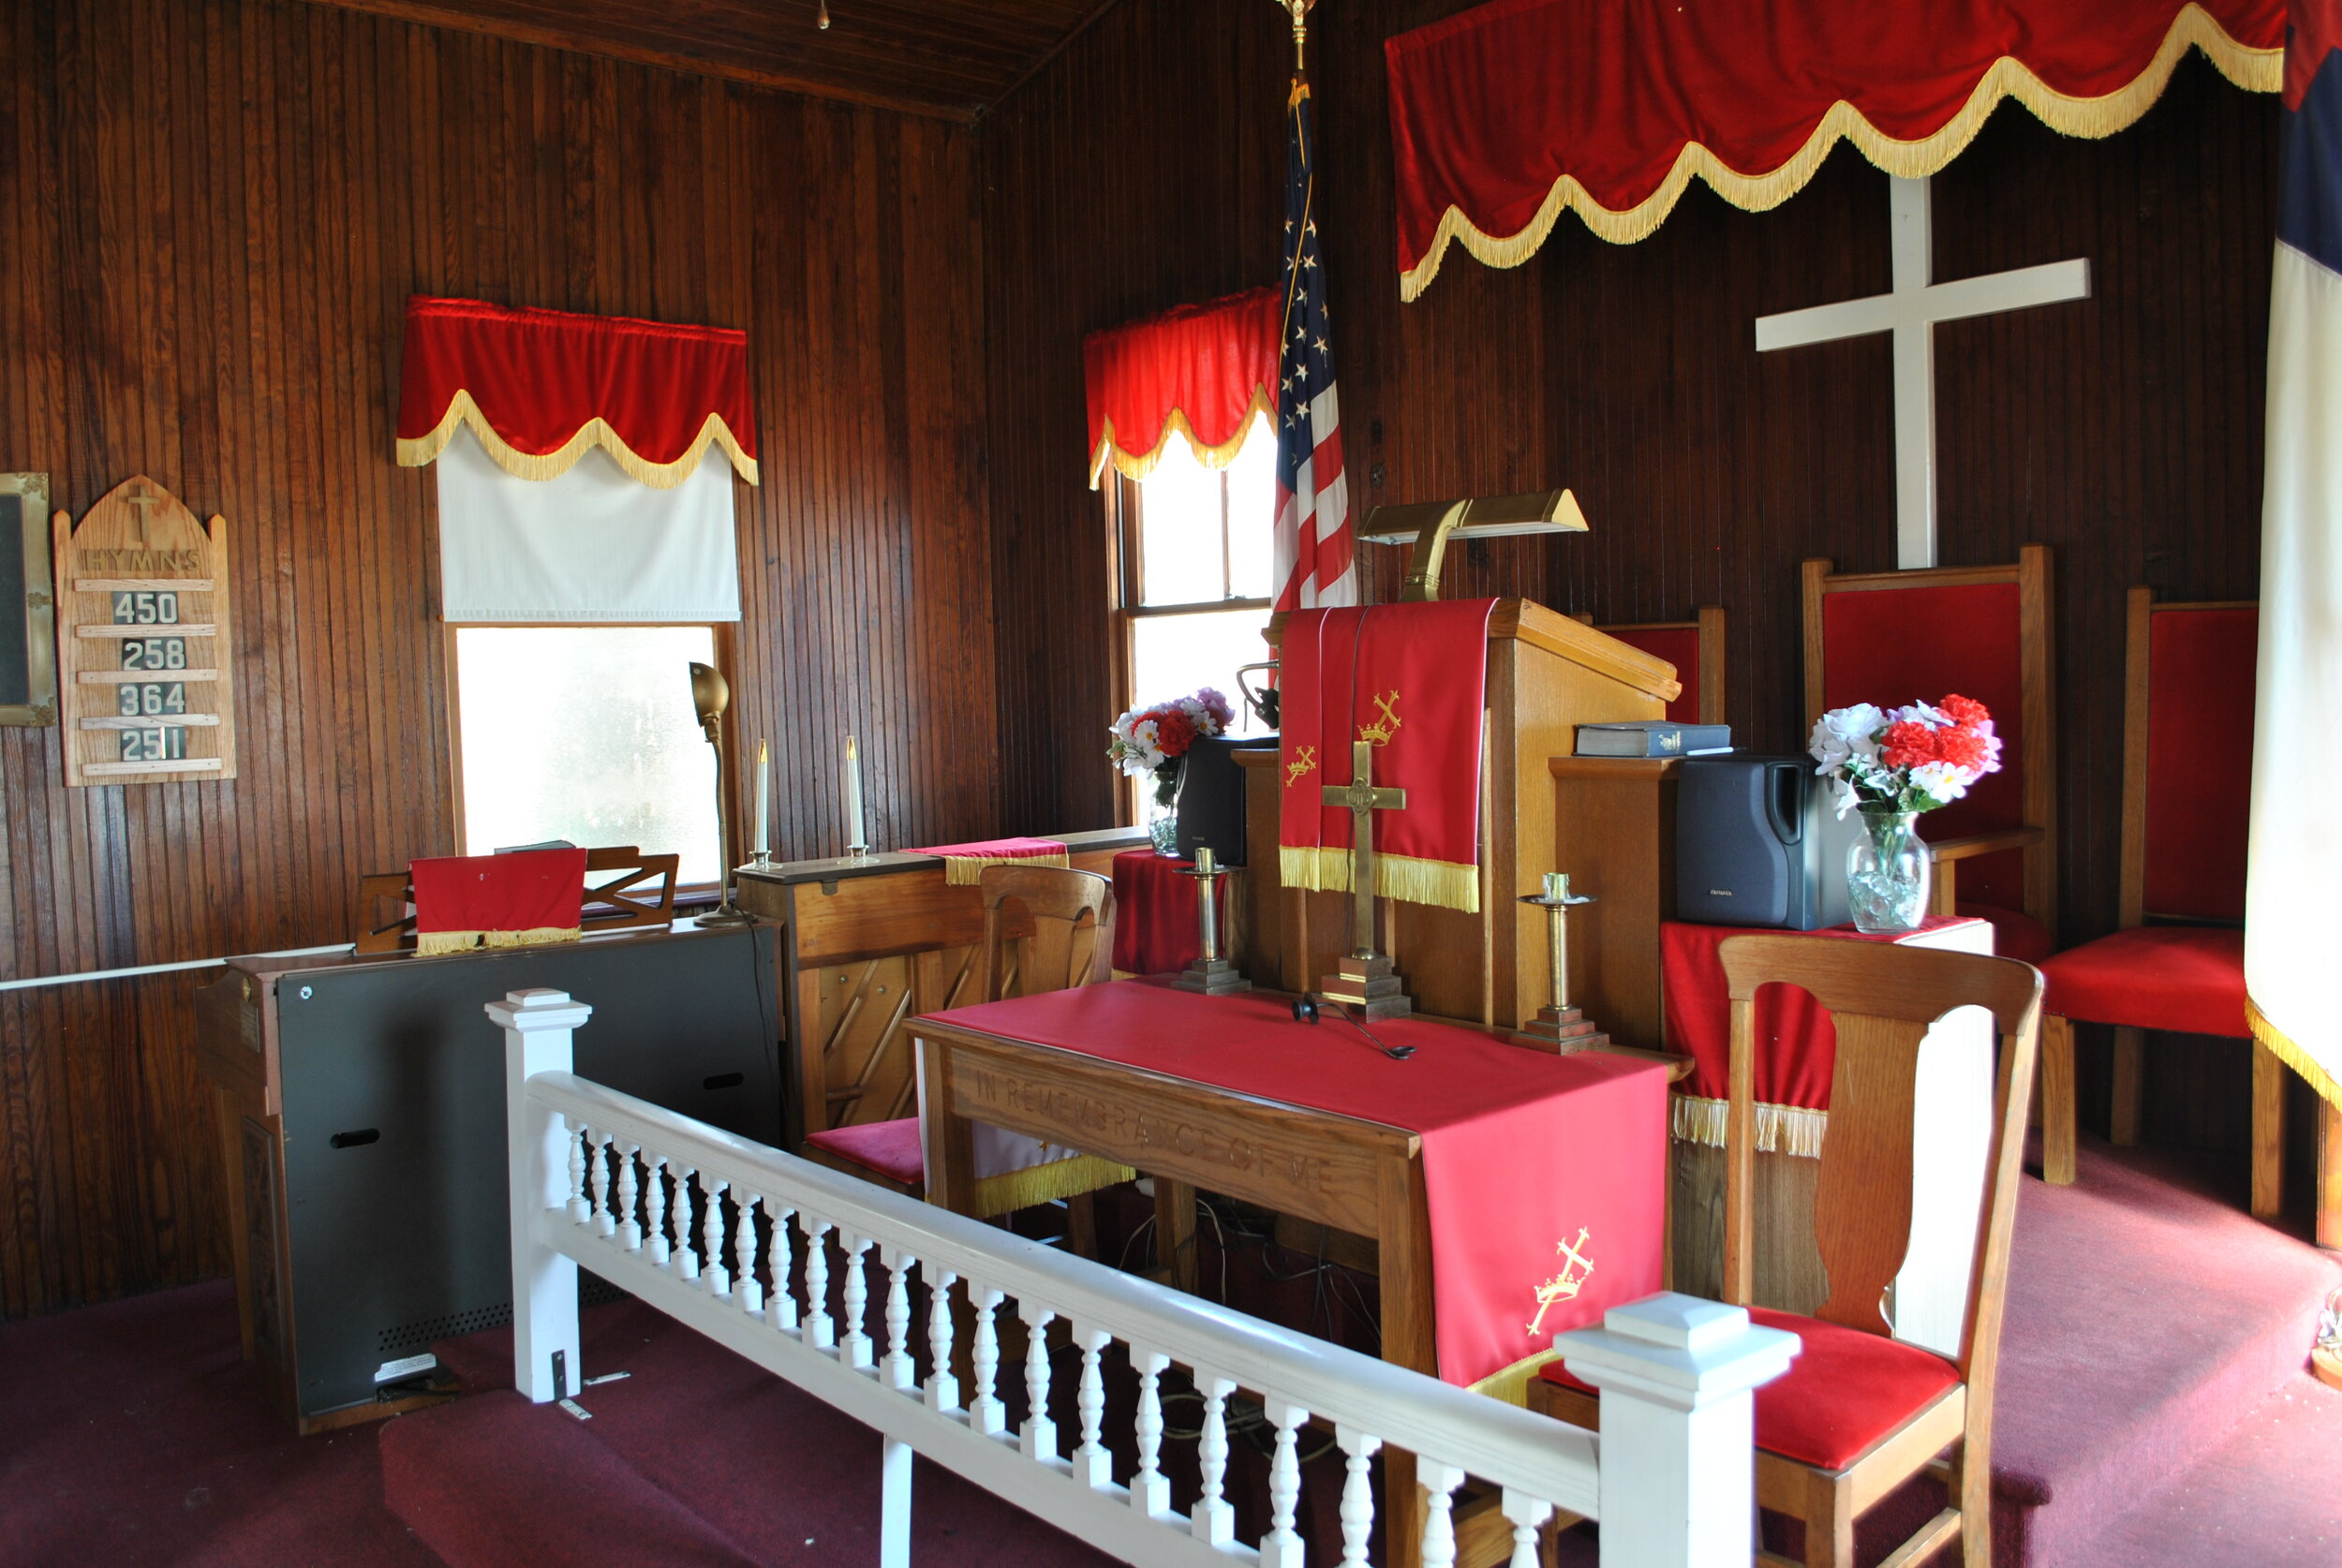 NJ_Somerset County_Mount Zion African Methodist Episcopal (AME) Church_0014.JPG